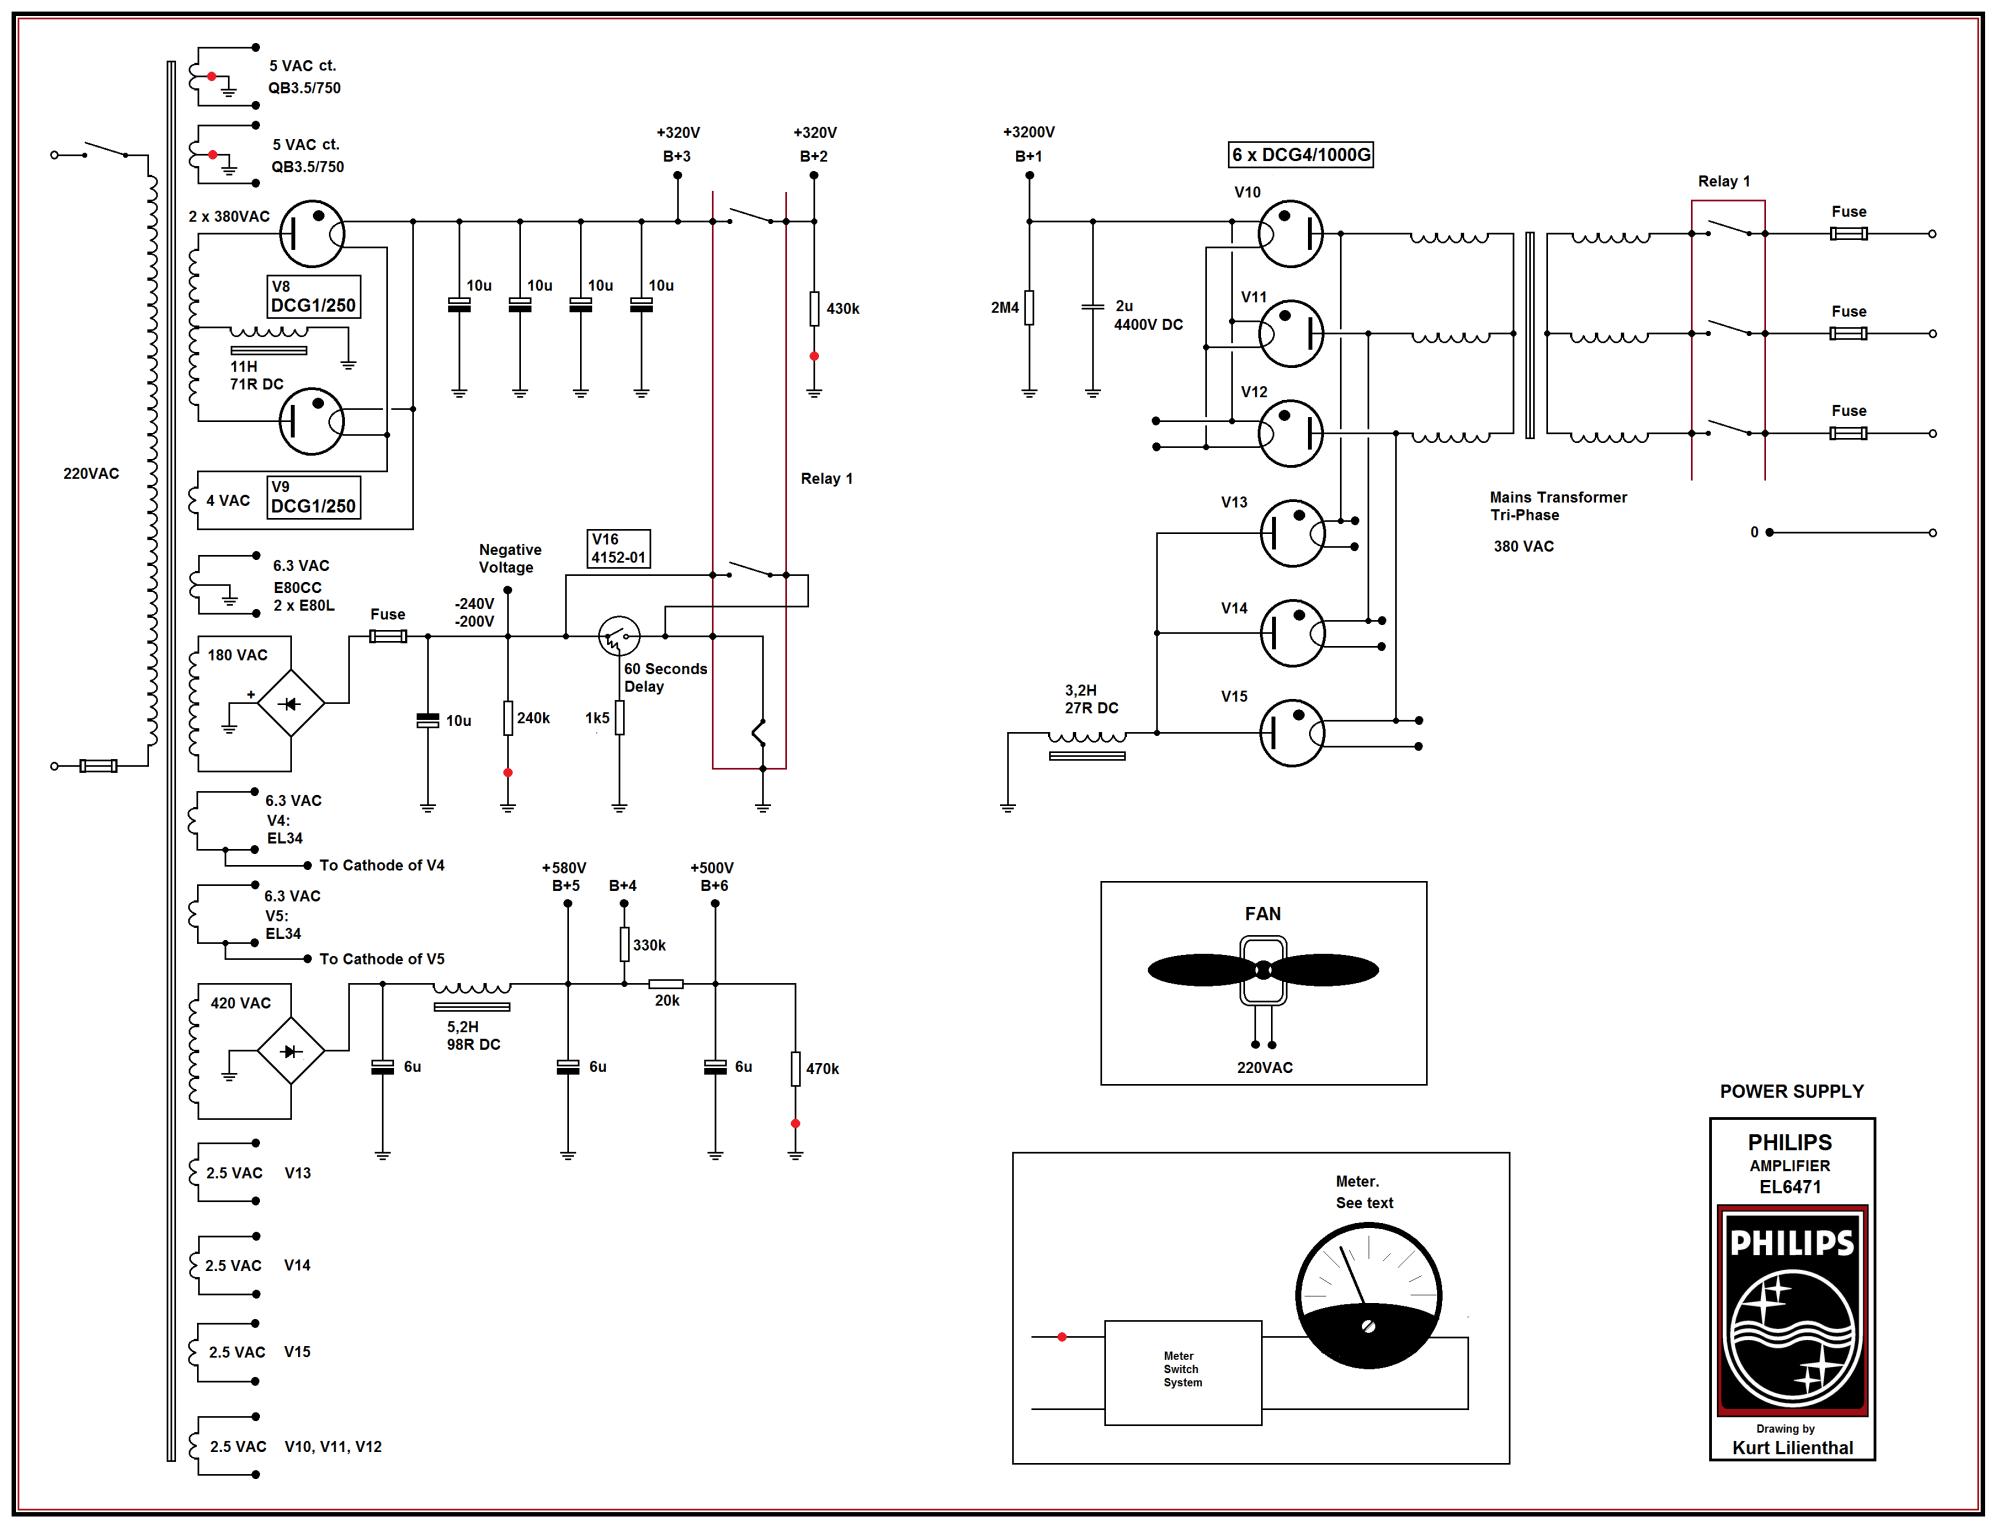 hight resolution of philips el6471 qb35 750 pp power supply ed